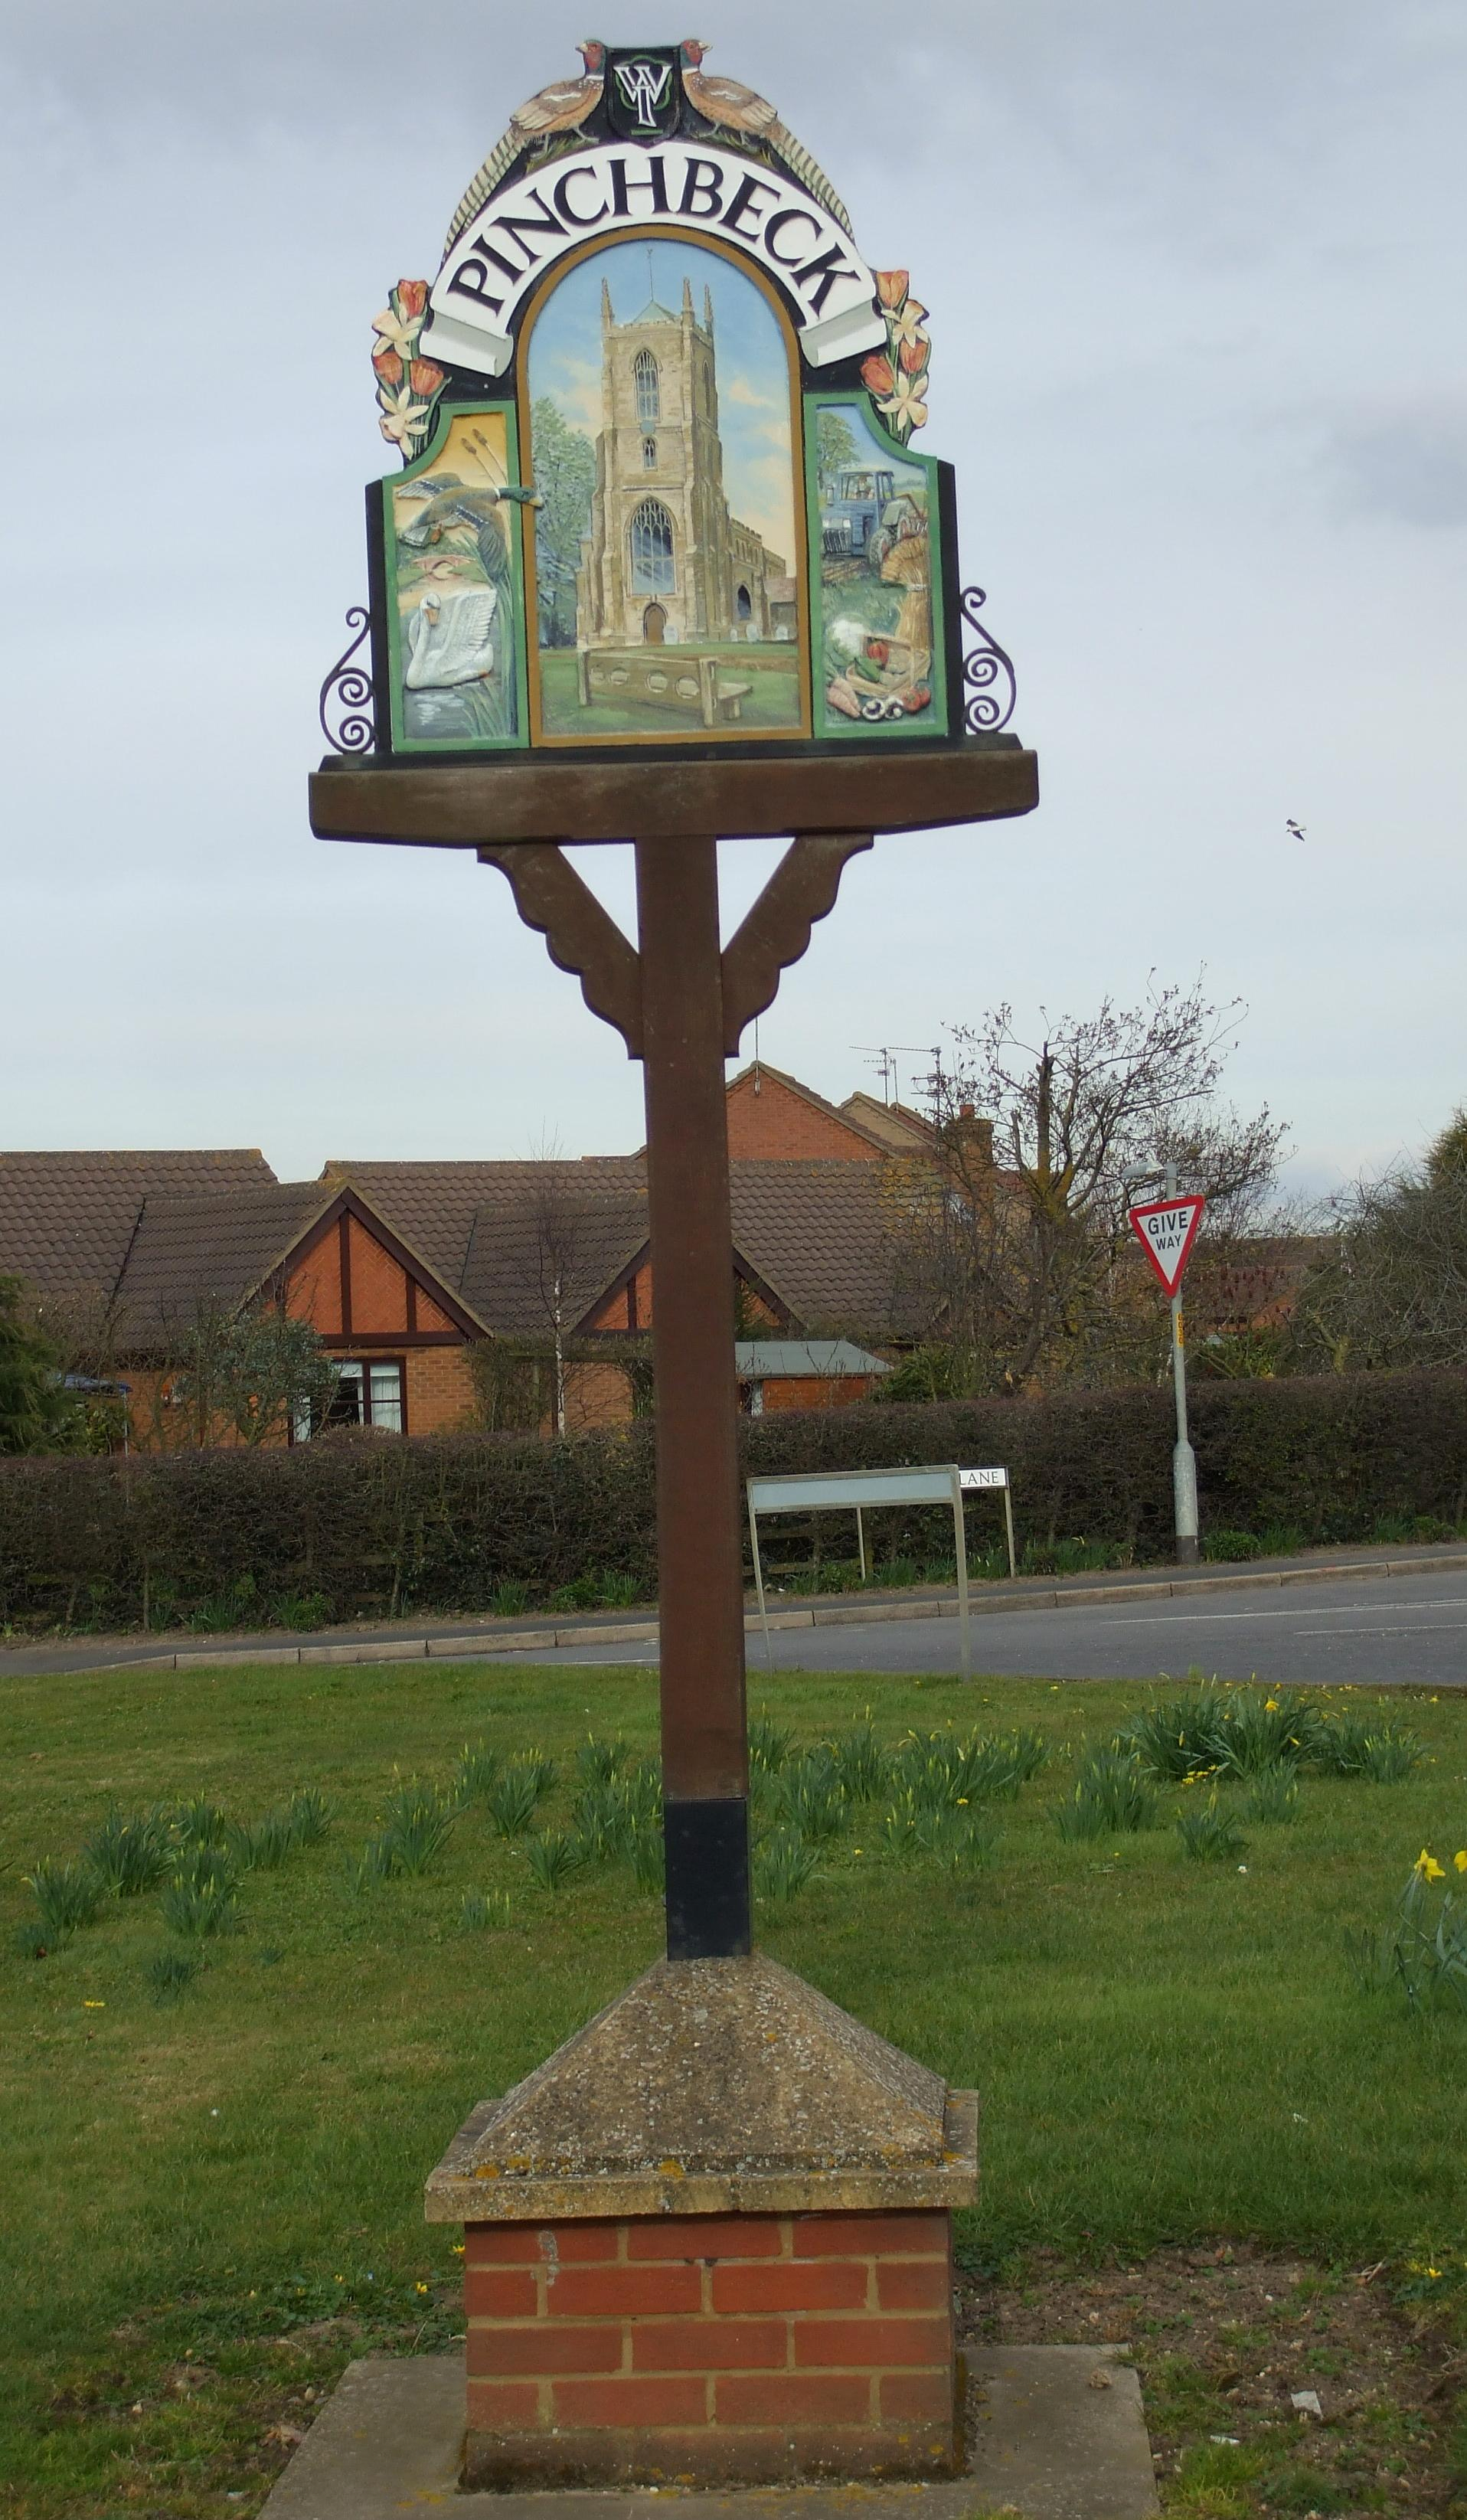 Pinchbeck sign 2